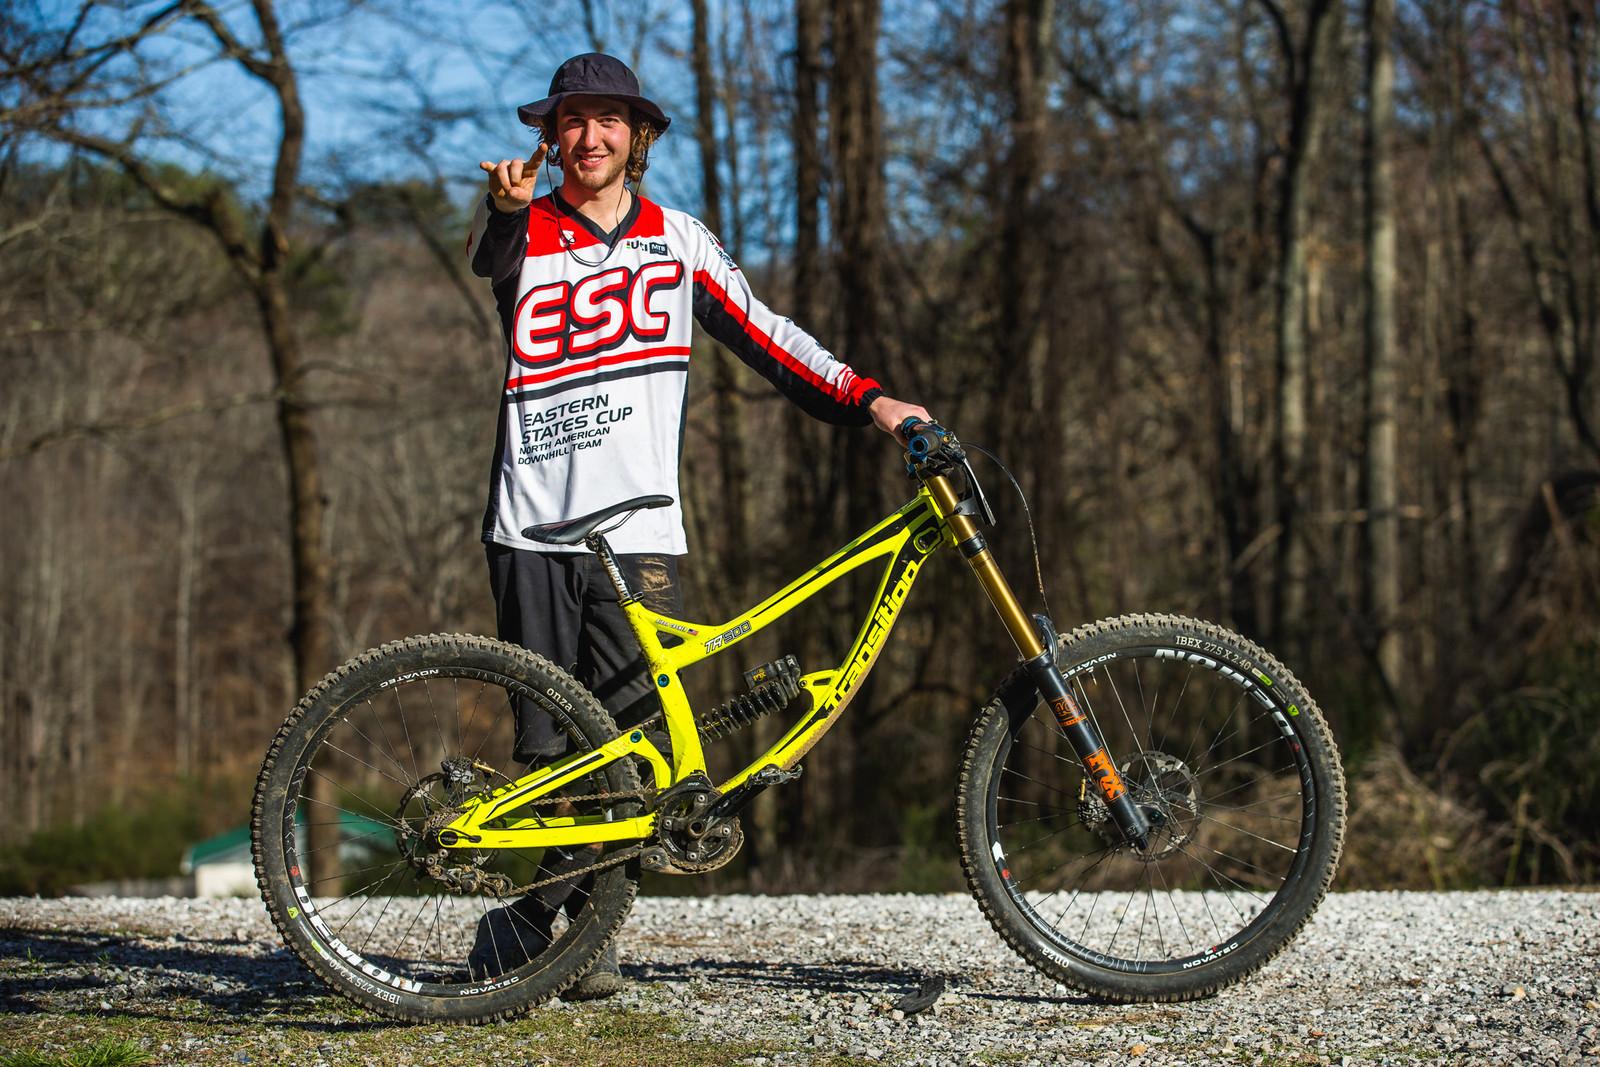 Pro GRT Pro Bike - Aidan Casner's Transition TR500 - Pro Bikes from Windrock Pro GRT - Mountain Biking Pictures - Vital MTB